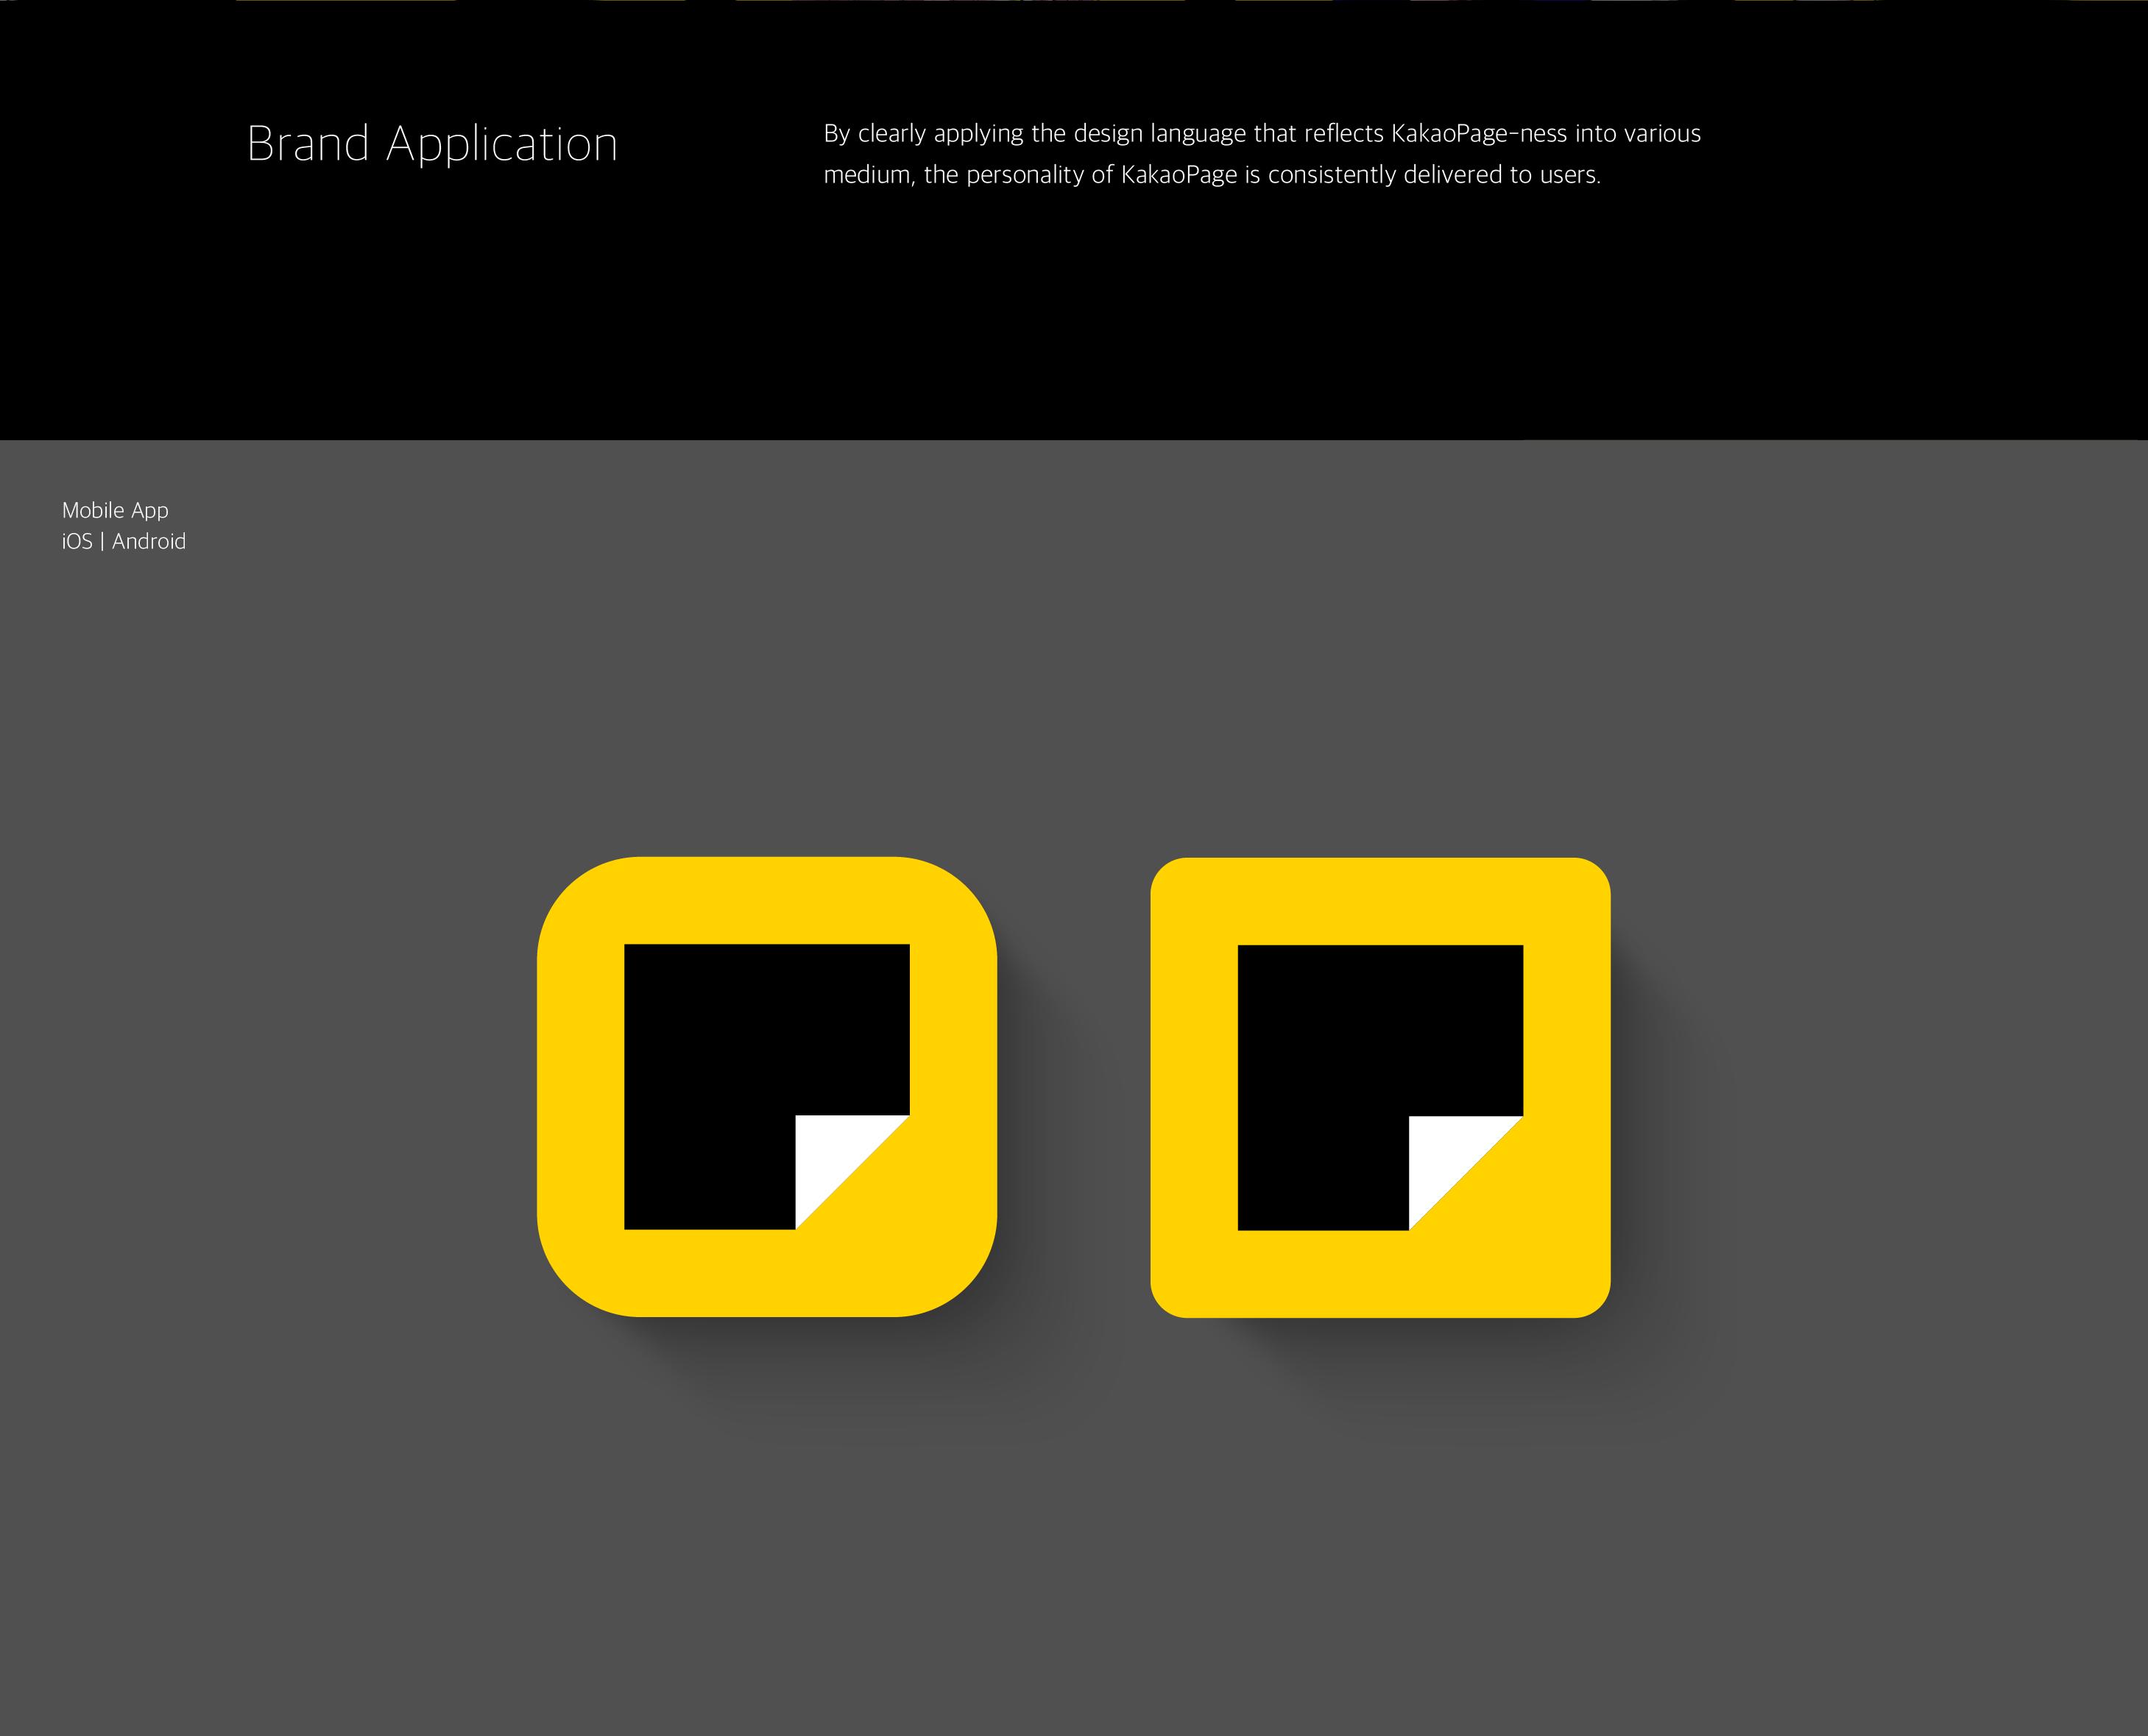 kakaopage-Brand-eXperience-Design-Renewal-26